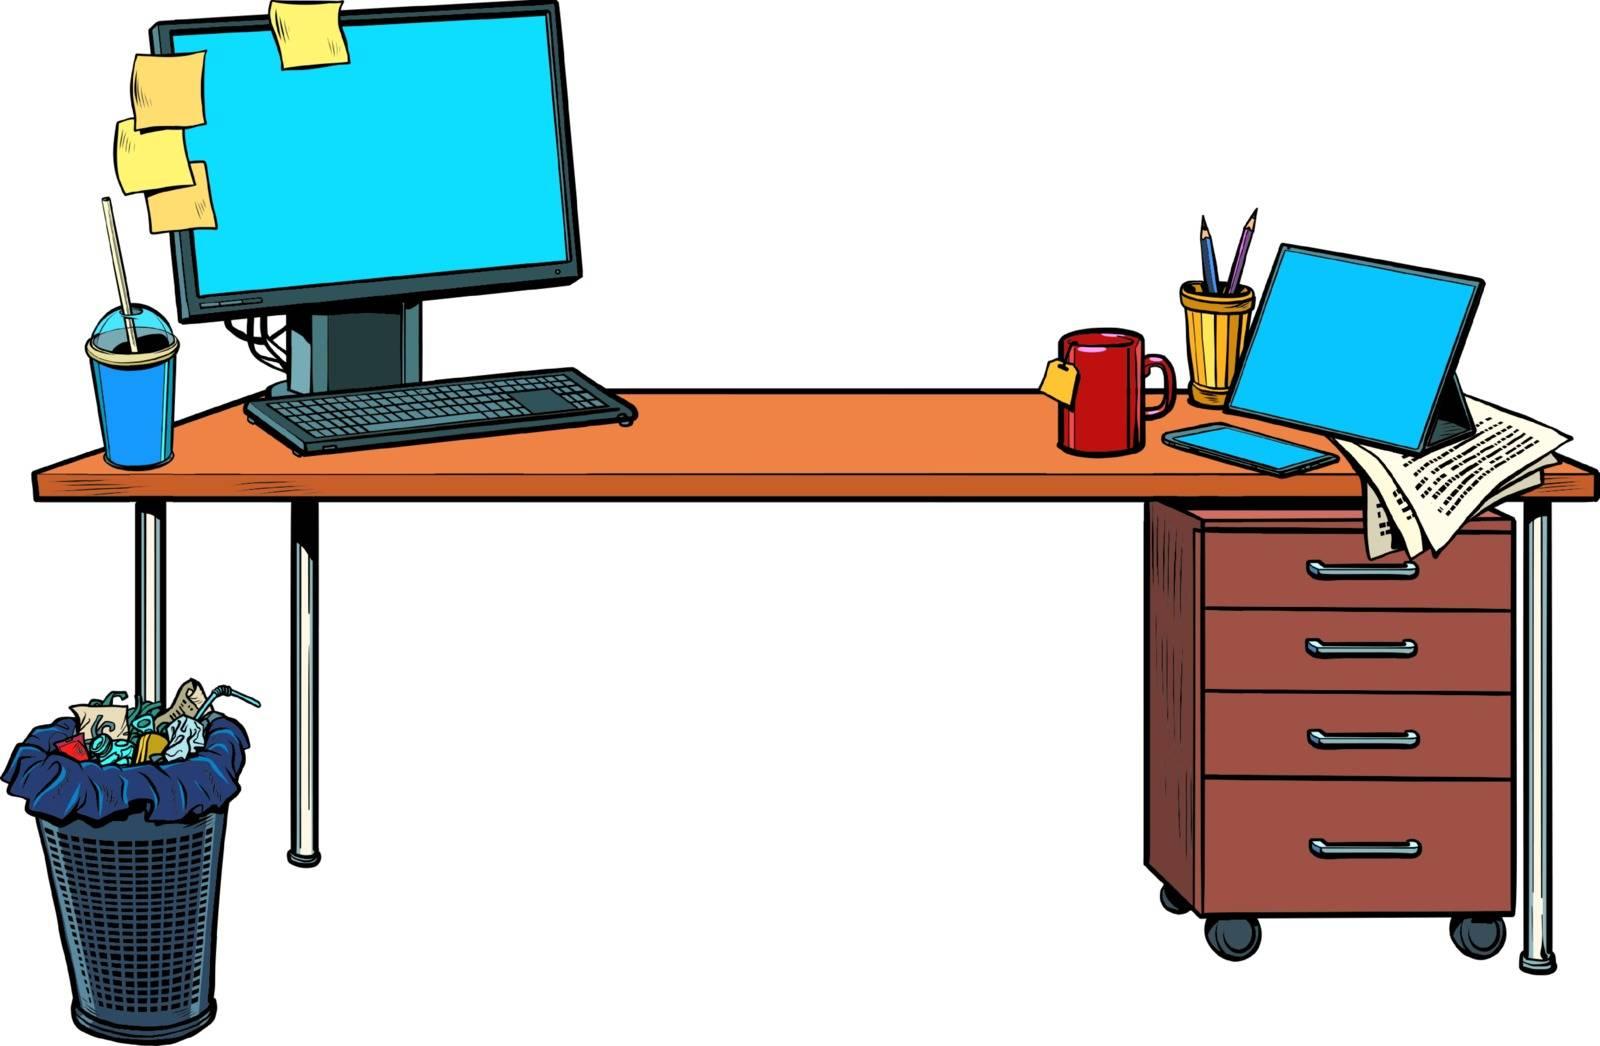 office Desk with computer. Pop art retro vector illustration vintage kitsch 50s 60s style